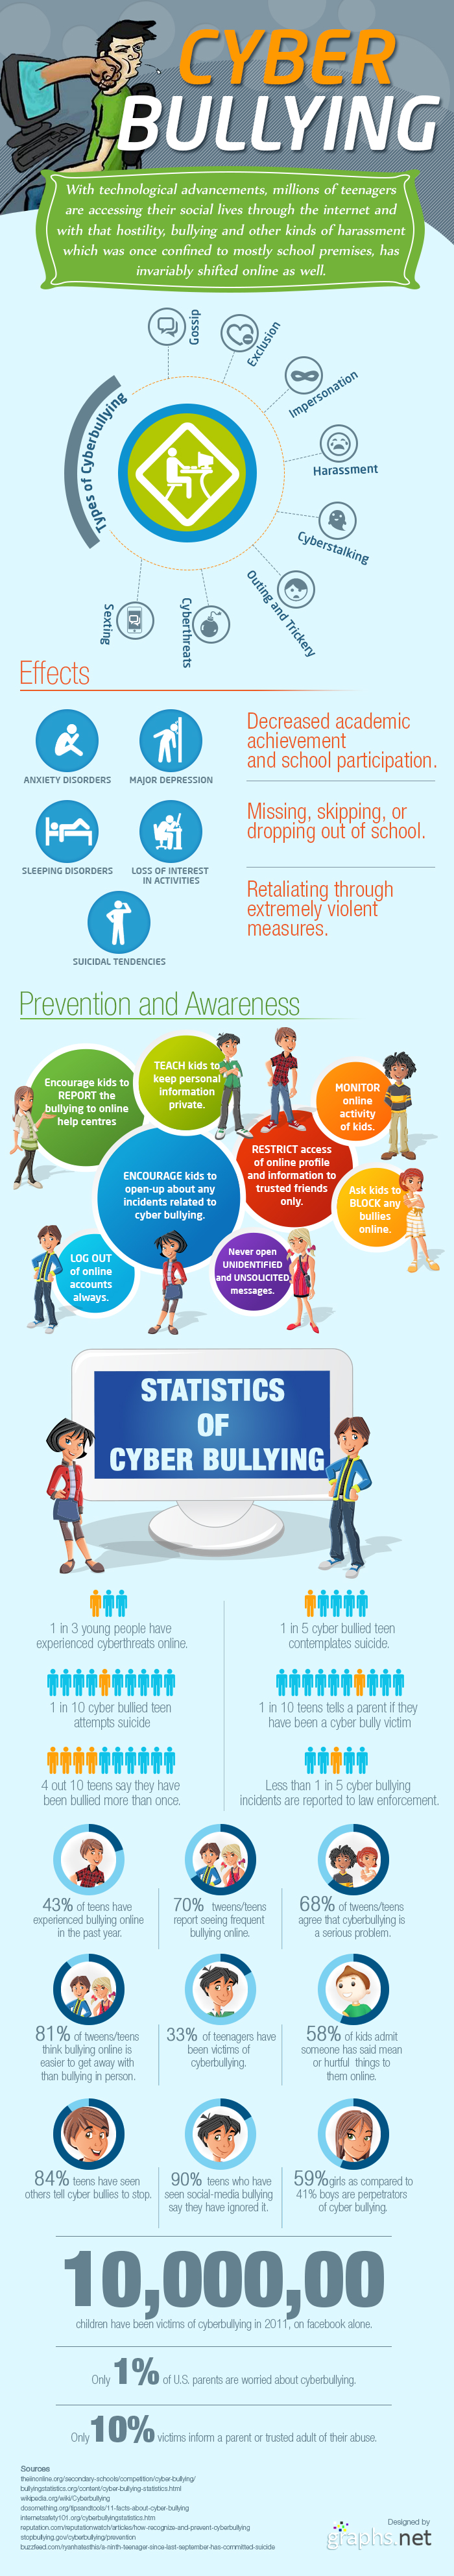 Cyber Bullying Statistics 2013 - Infographics | Graphs net